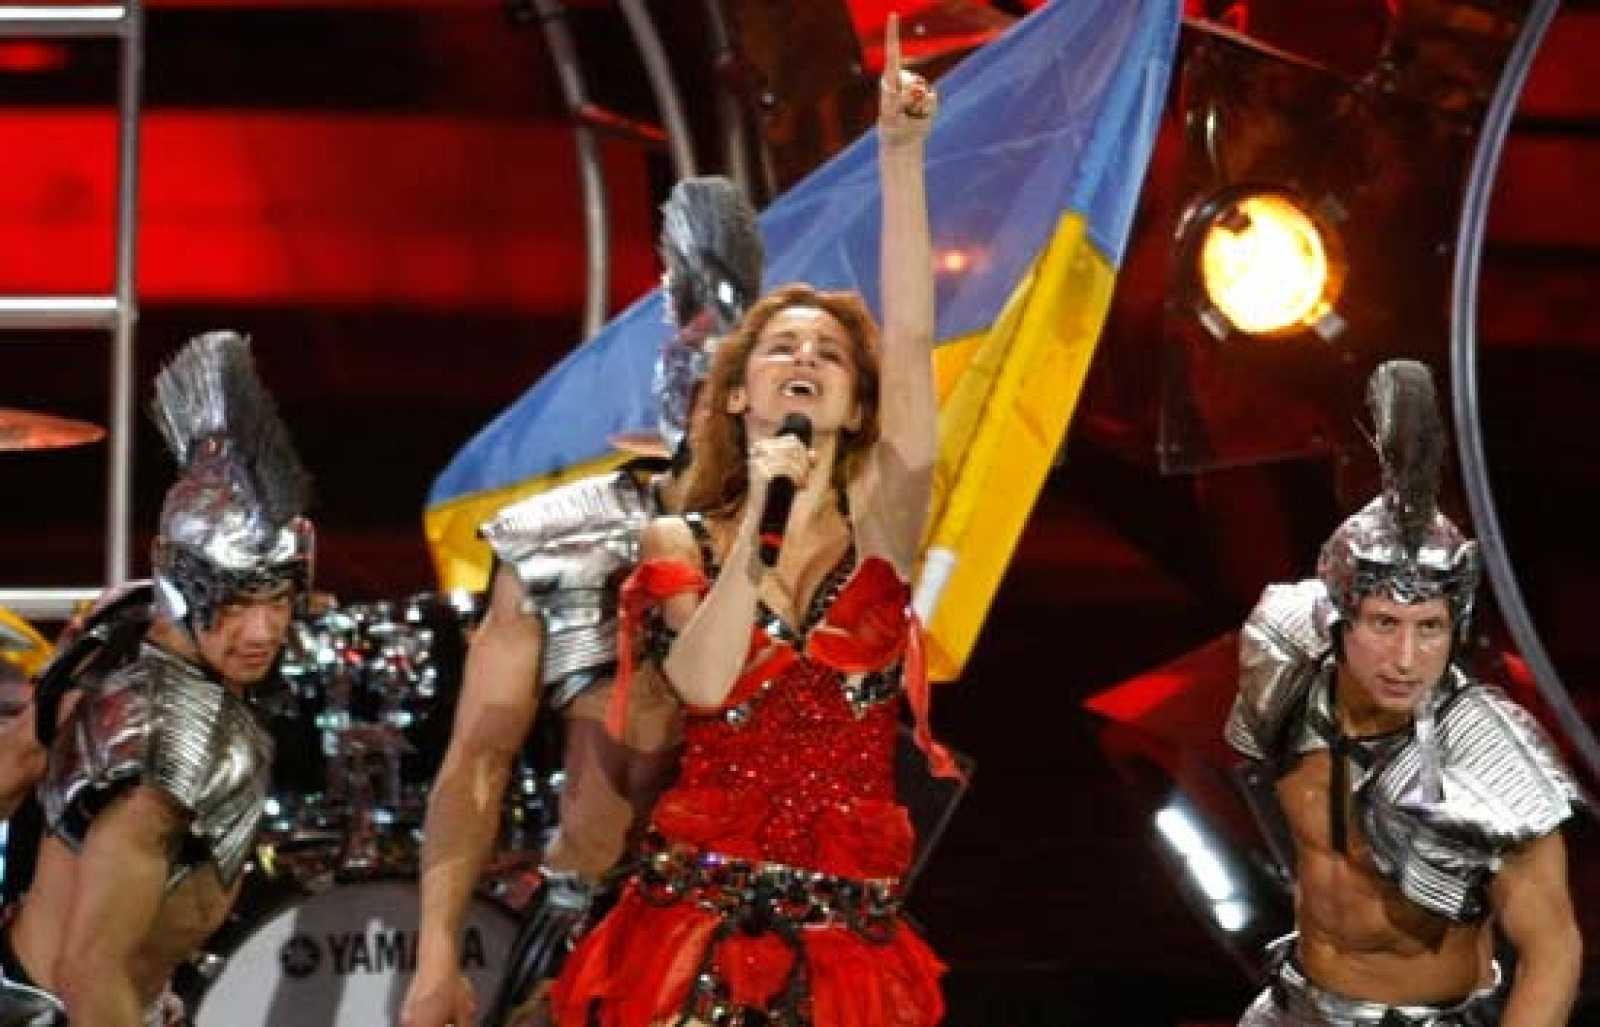 Eurovisión 2009 - Ucrania: Be my Valentine (Anti-crisis girl)